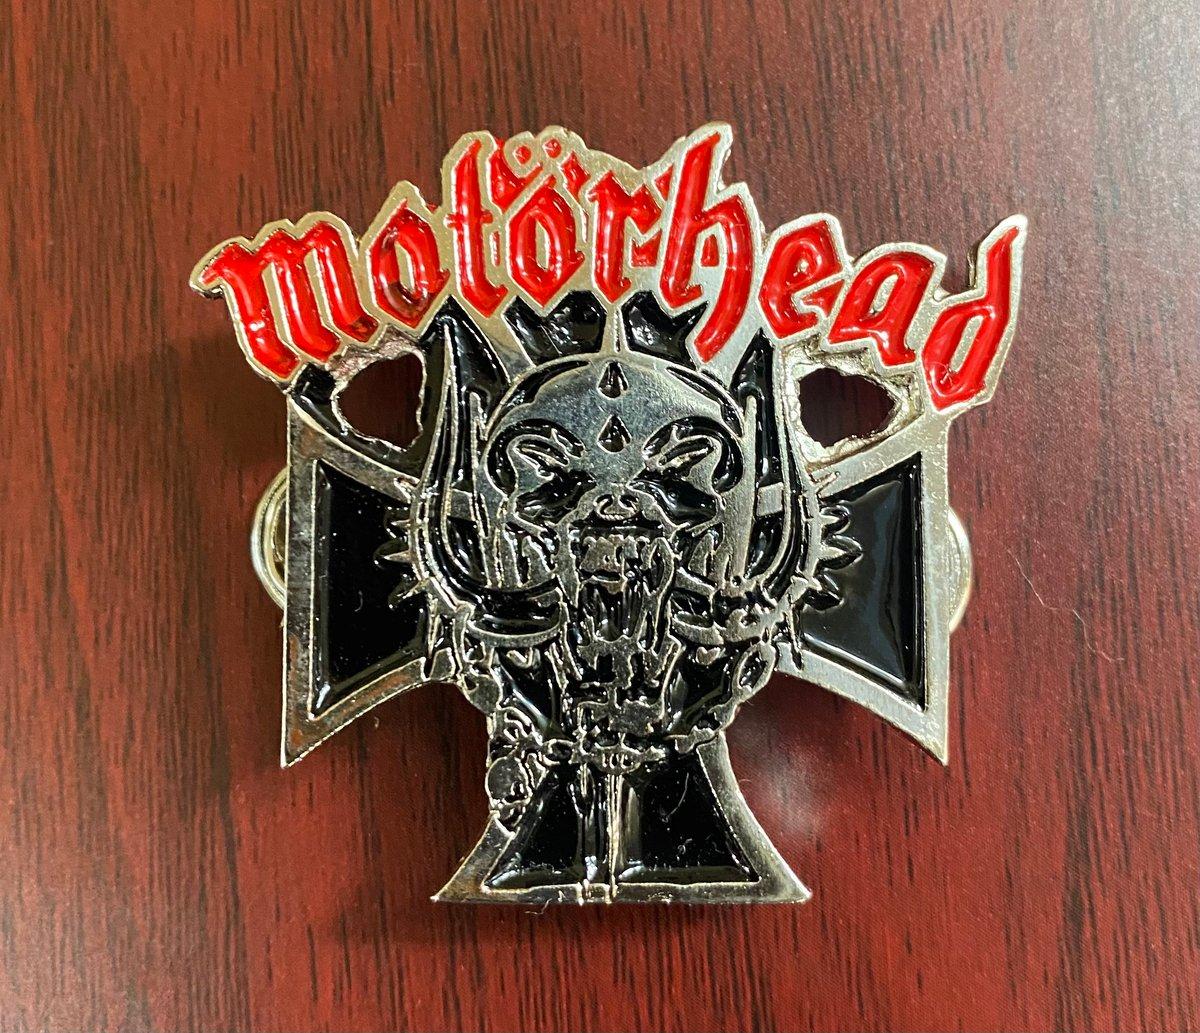 Image of Motörhead Live Fast Die Old